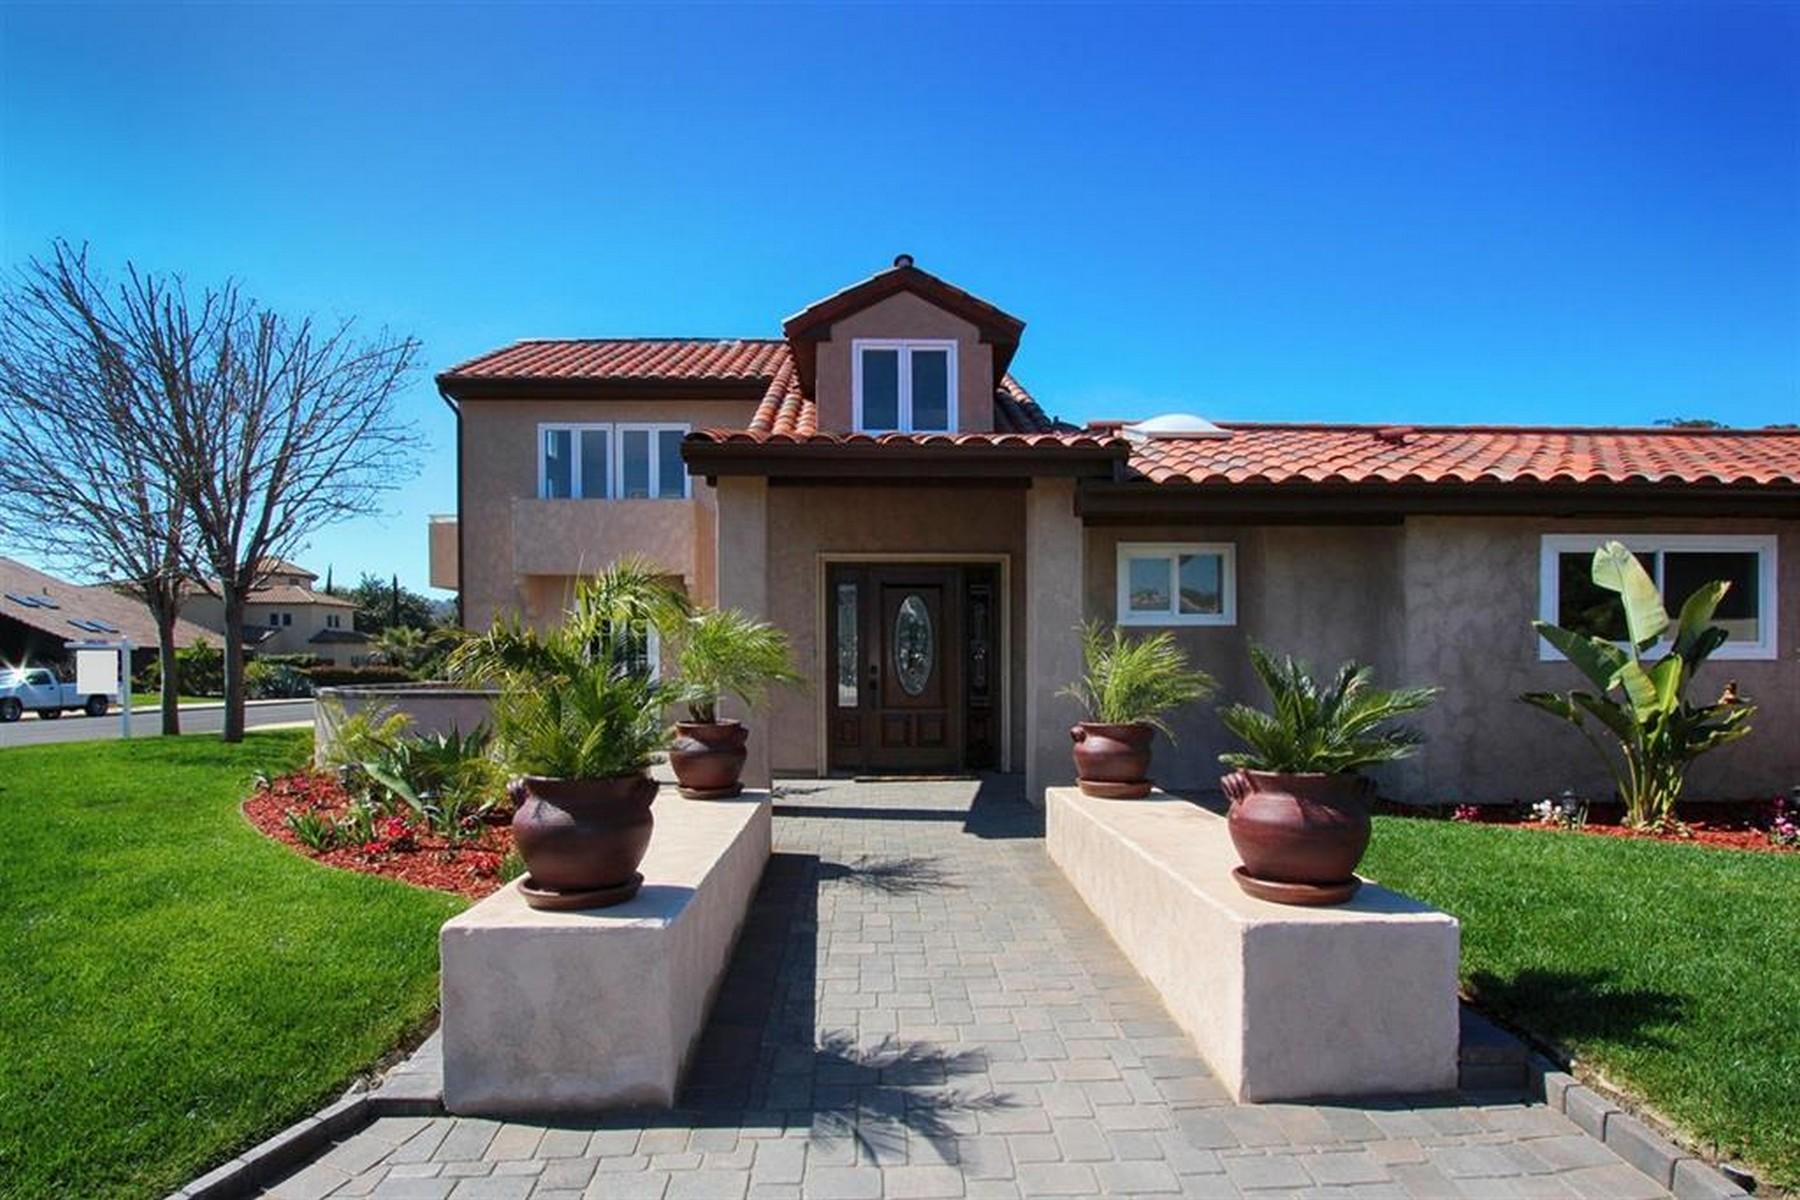 Single Family Home for Sale at Whispering Palms 3934 Via Valle Verde Rancho Santa Fe, California 92091 United States